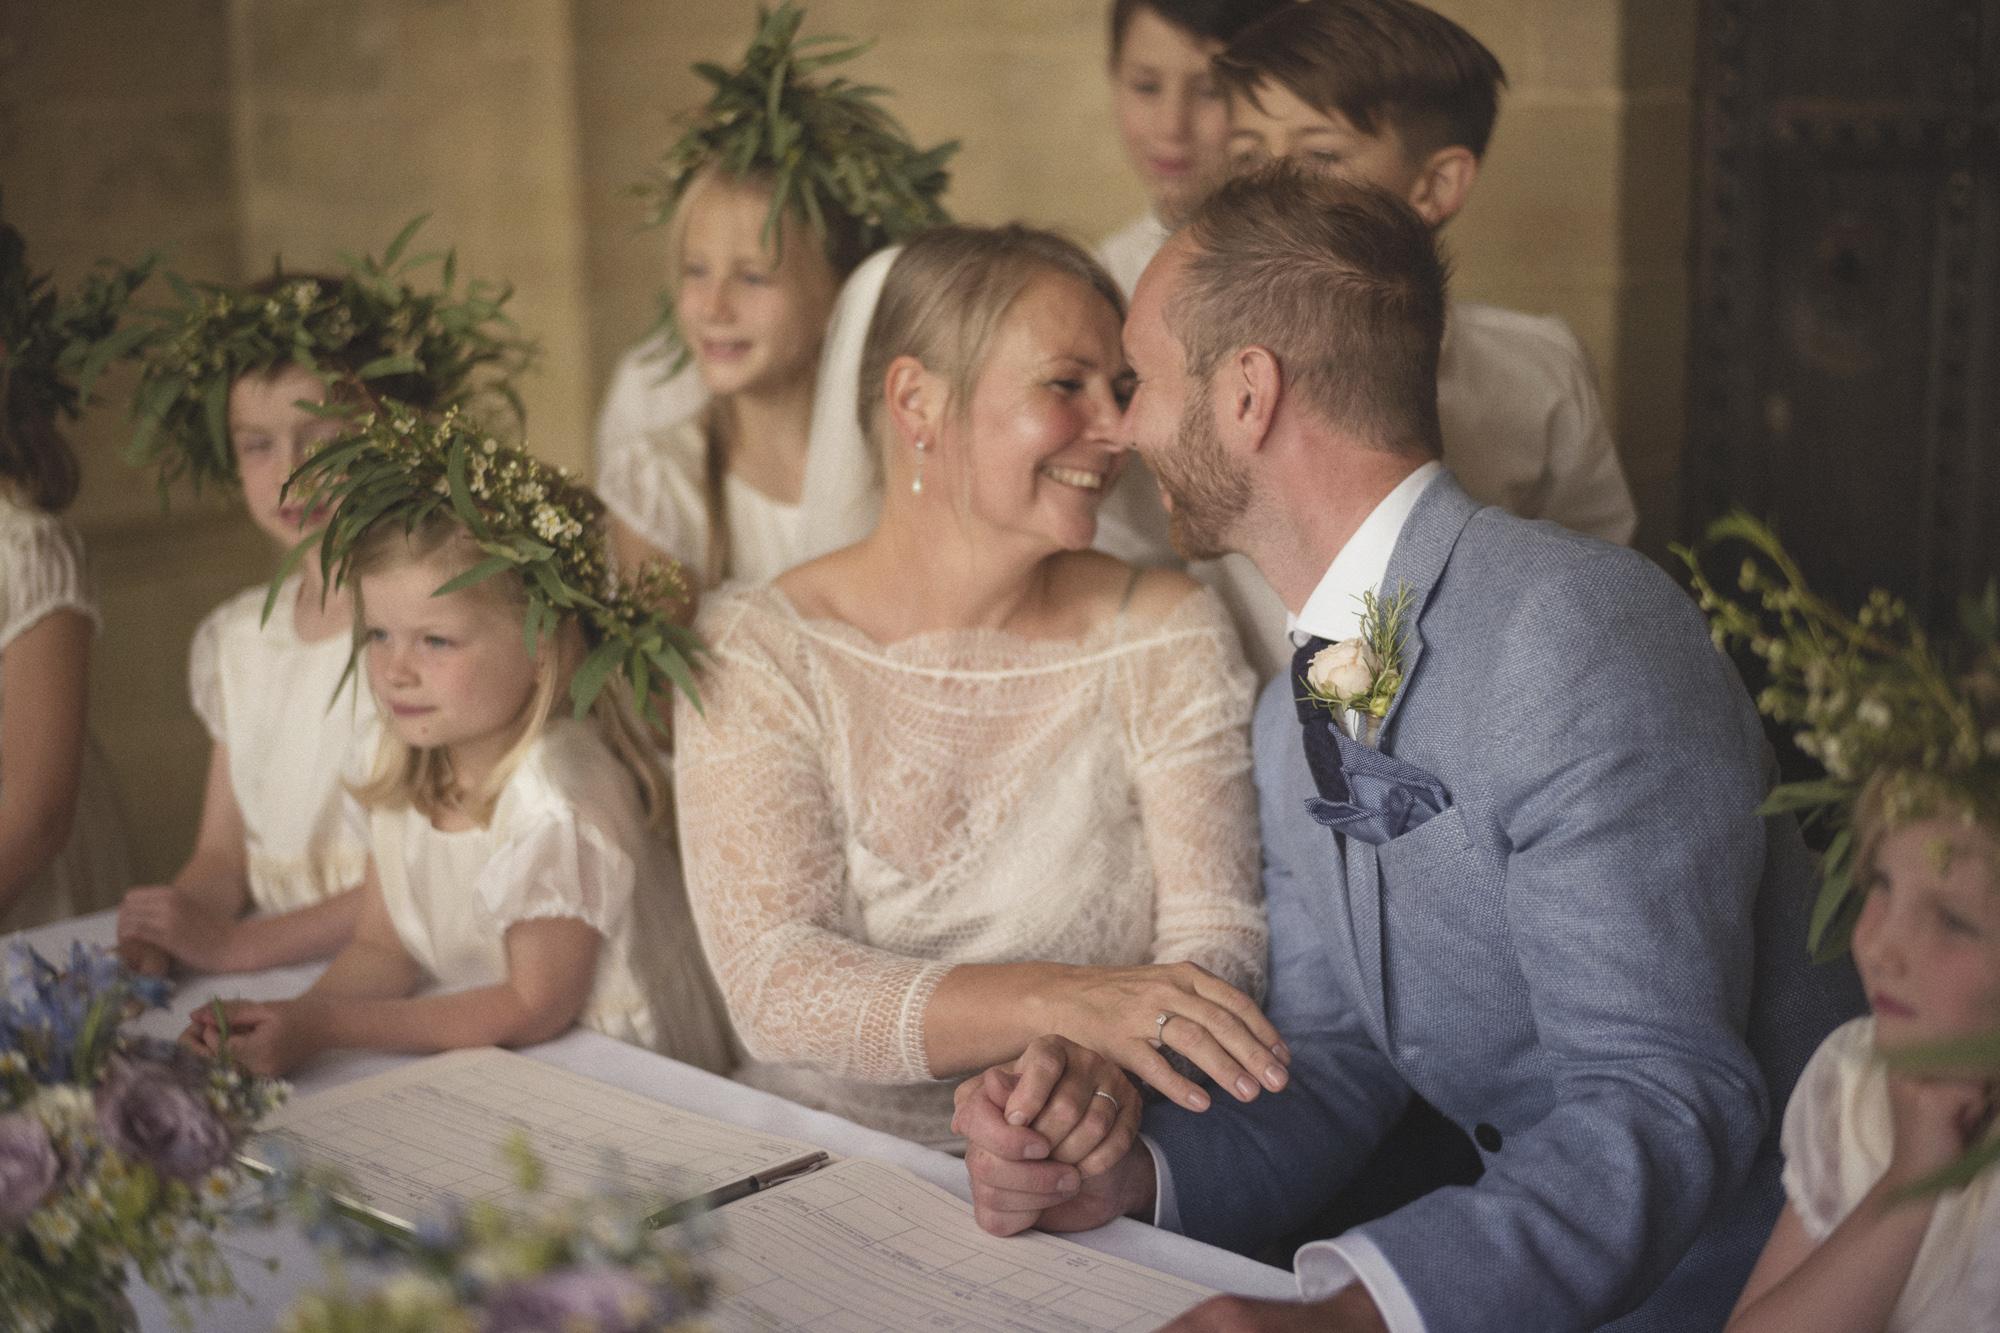 Jaz-Kate-Beaumont-Oyster-Silk-Bias-Cut-Wedding-Gown-Larkspur-Lace-Top-Sussex-Wedding-10.jpg